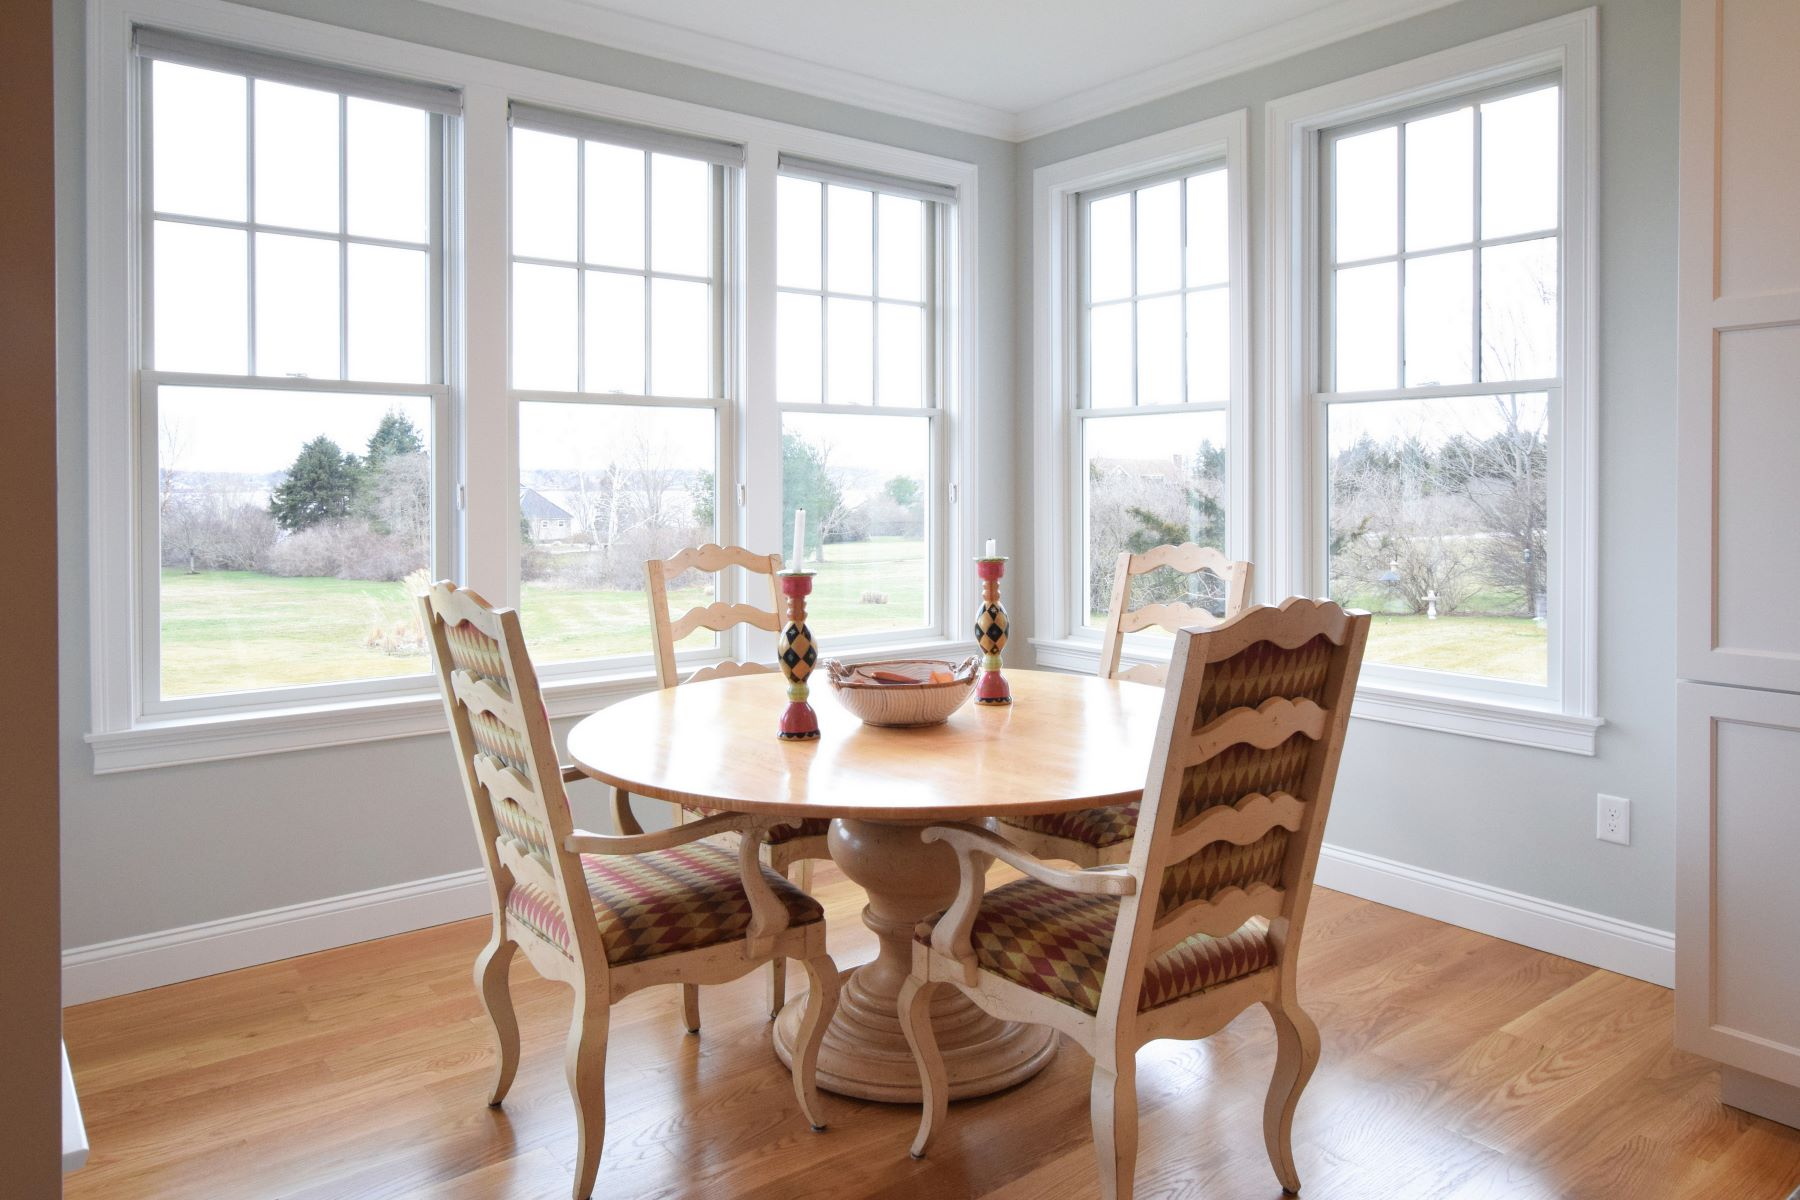 Additional photo for property listing at Sea Berry Farm 0 Vanderbilt Lane Portsmouth, Rhode Island 02871 United States